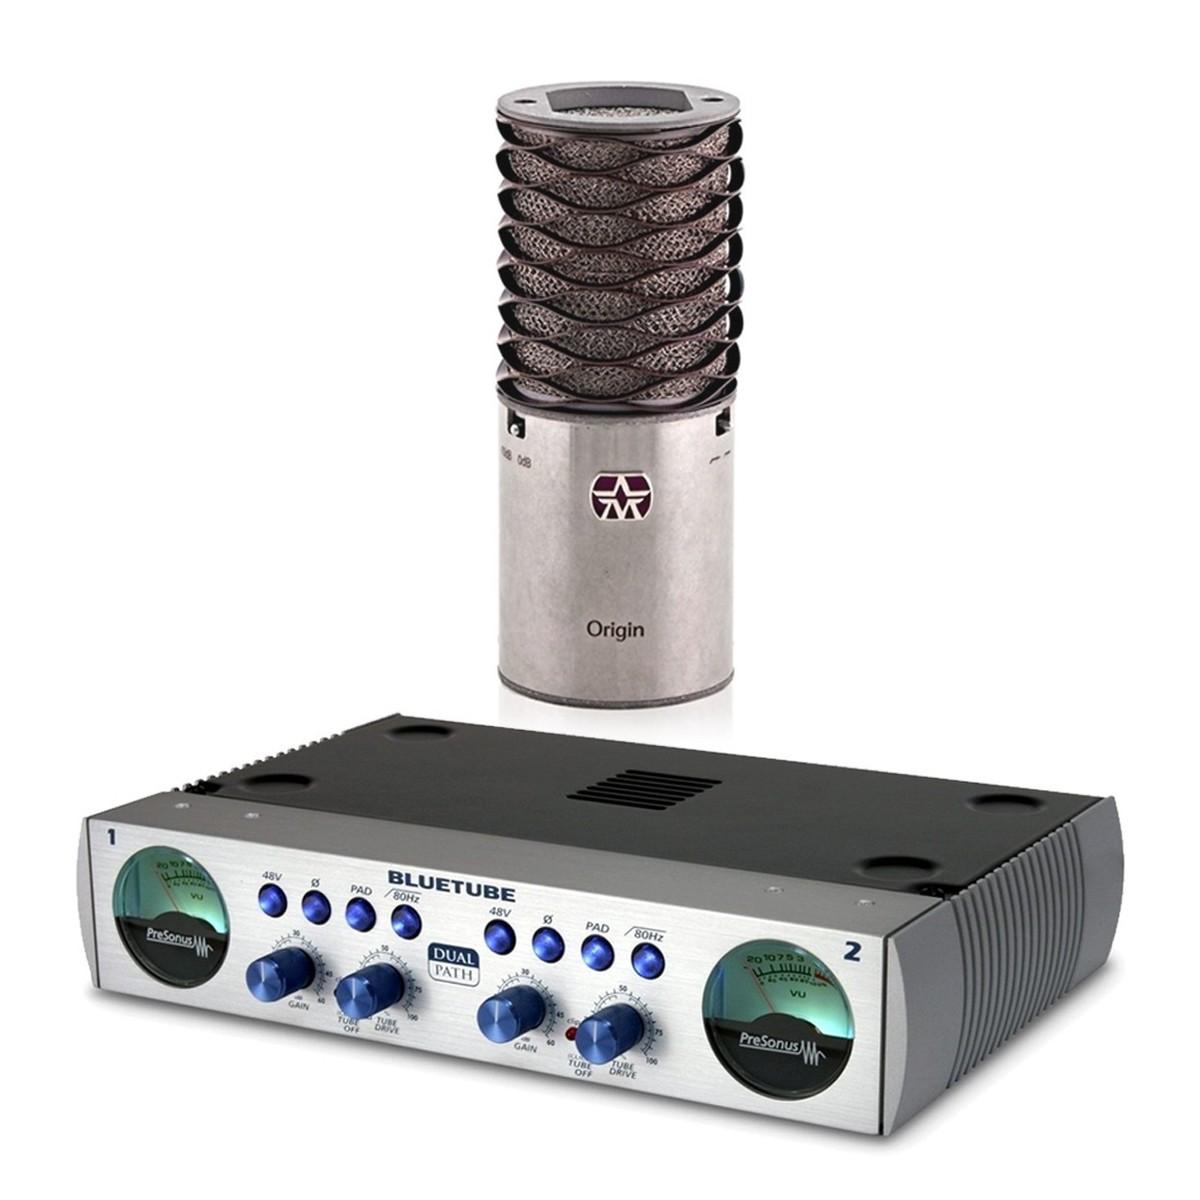 aston microphones origin with presonus bluetube preamp at. Black Bedroom Furniture Sets. Home Design Ideas